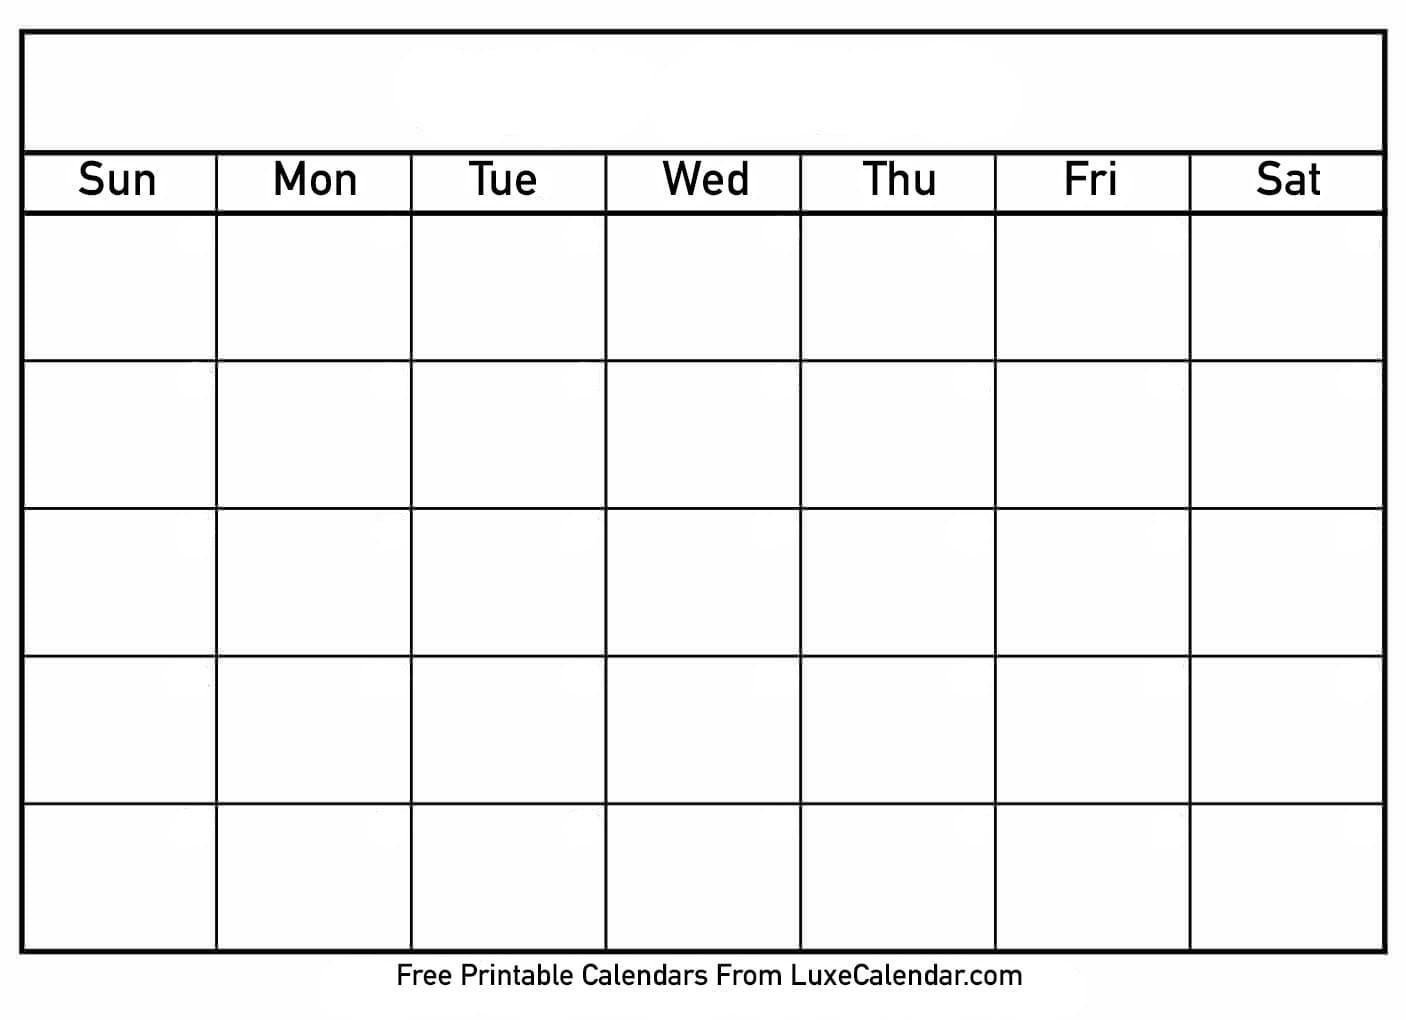 Full Page Blank Calendar - Kenom  Full Page Blank Calendar Printable